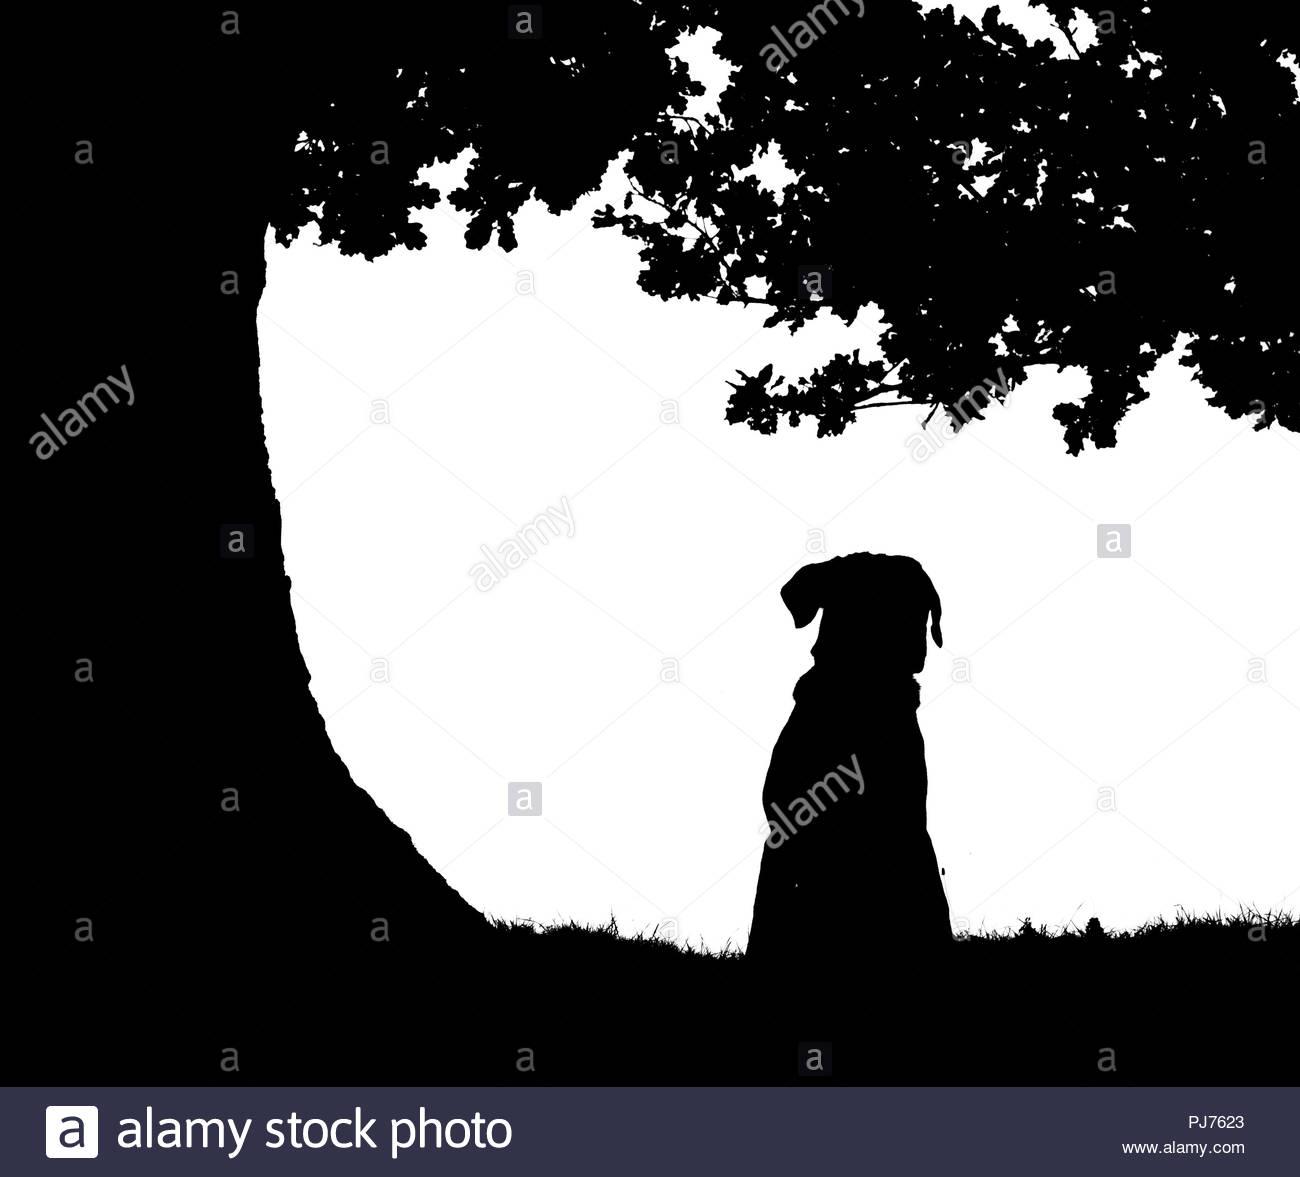 Dog Sitting Under An Oak Tree In Silhouette Stock Photo  217746651